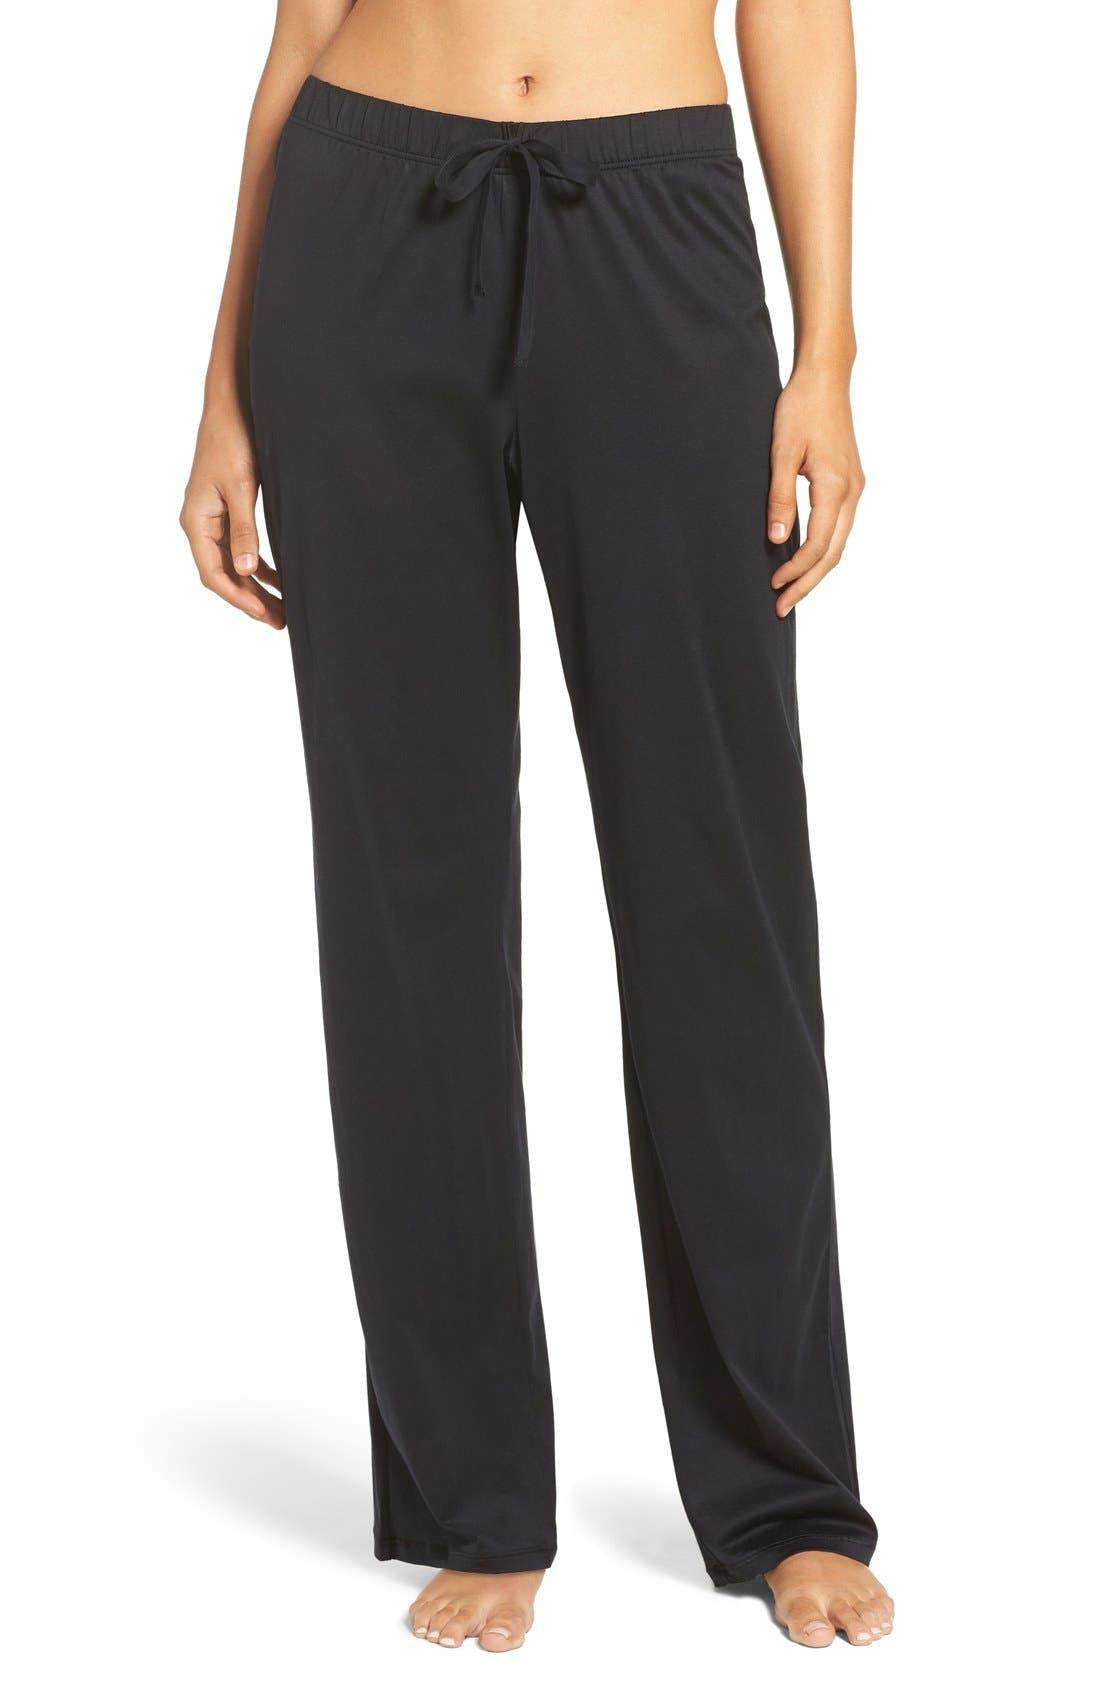 Alternate Image 1 Selected - Hanro Cotton Lounge Pants